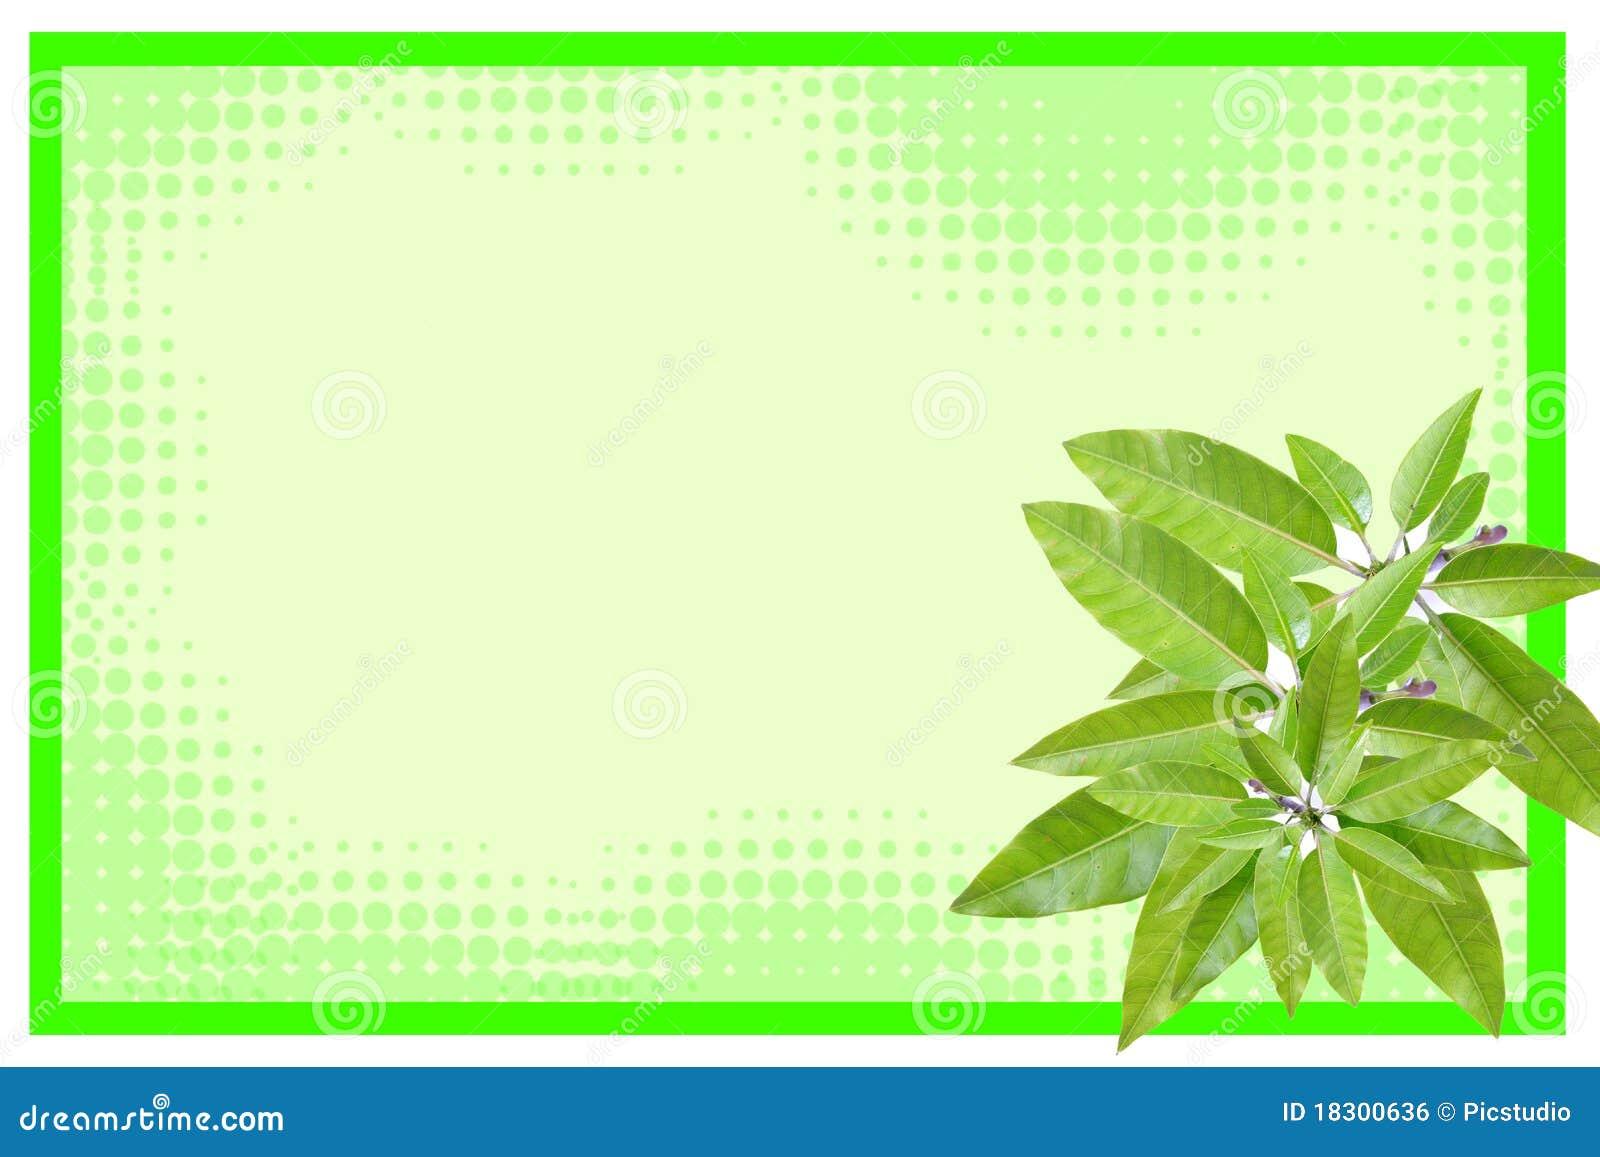 Mango leaves frame stock illustration. Illustration of jungle - 18300636